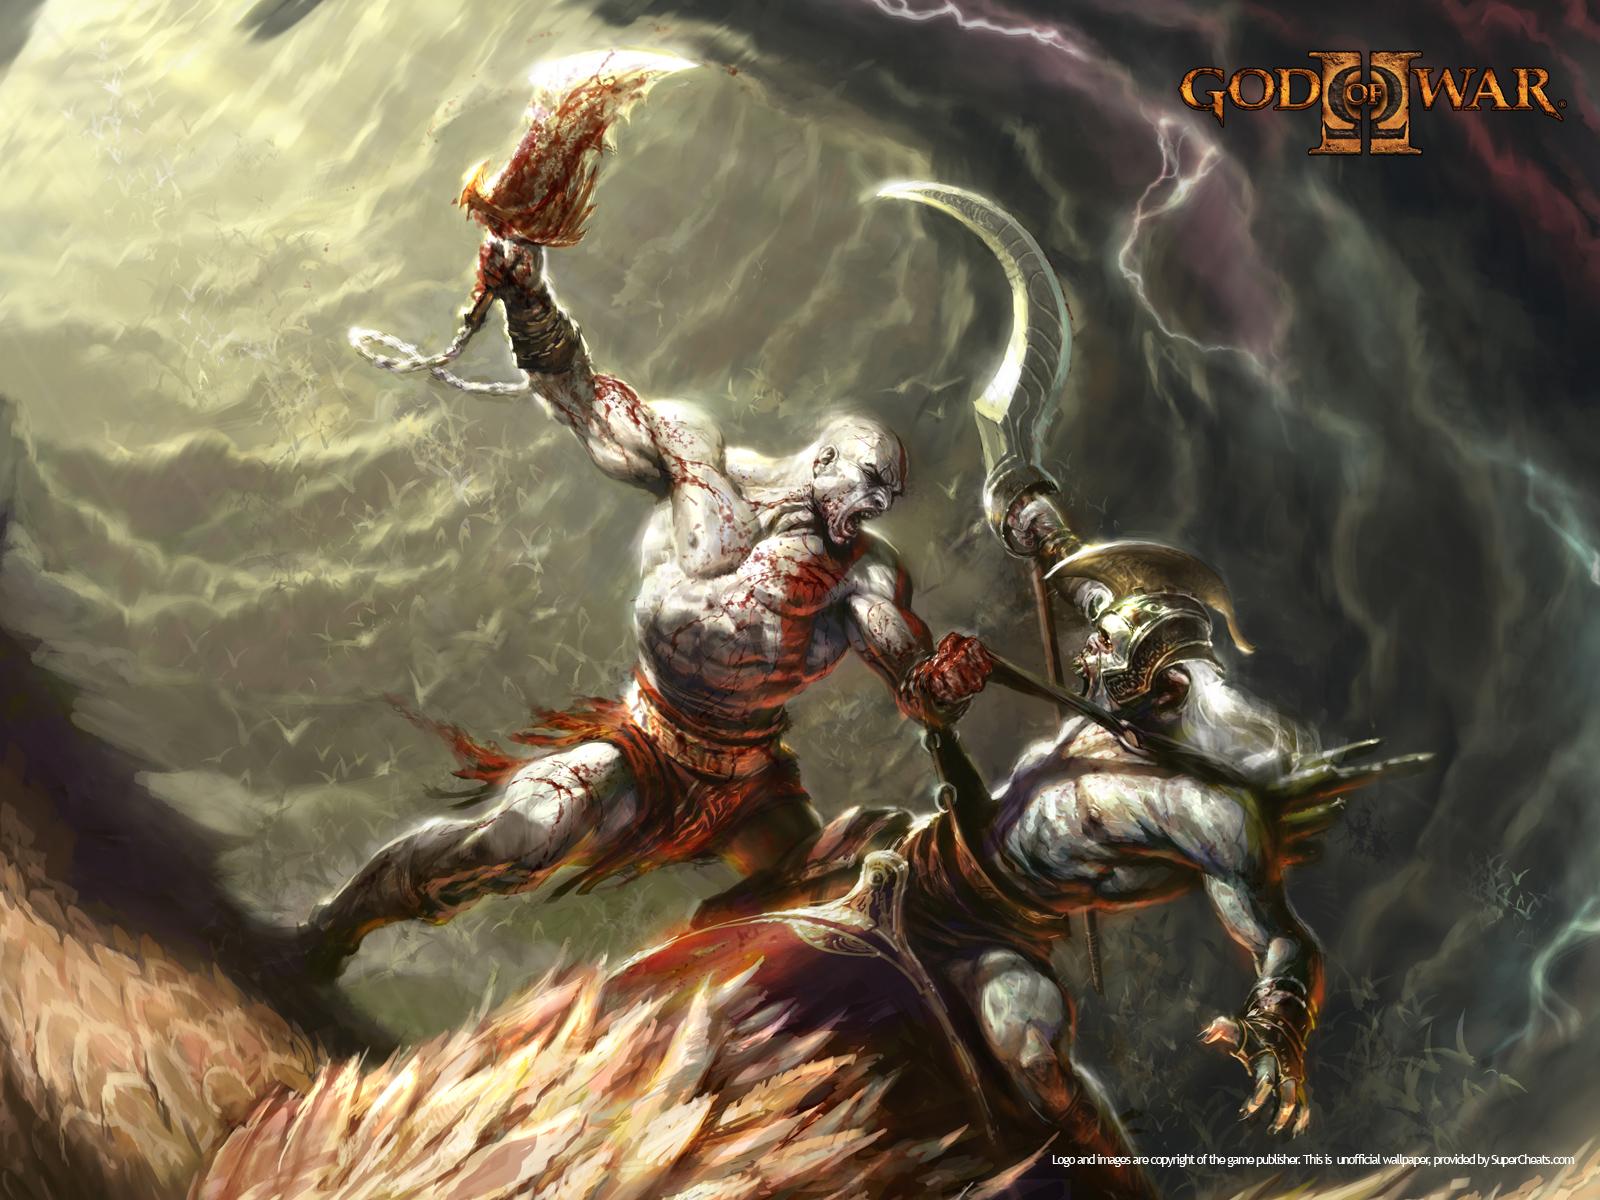 God of War 2 Wallpapers